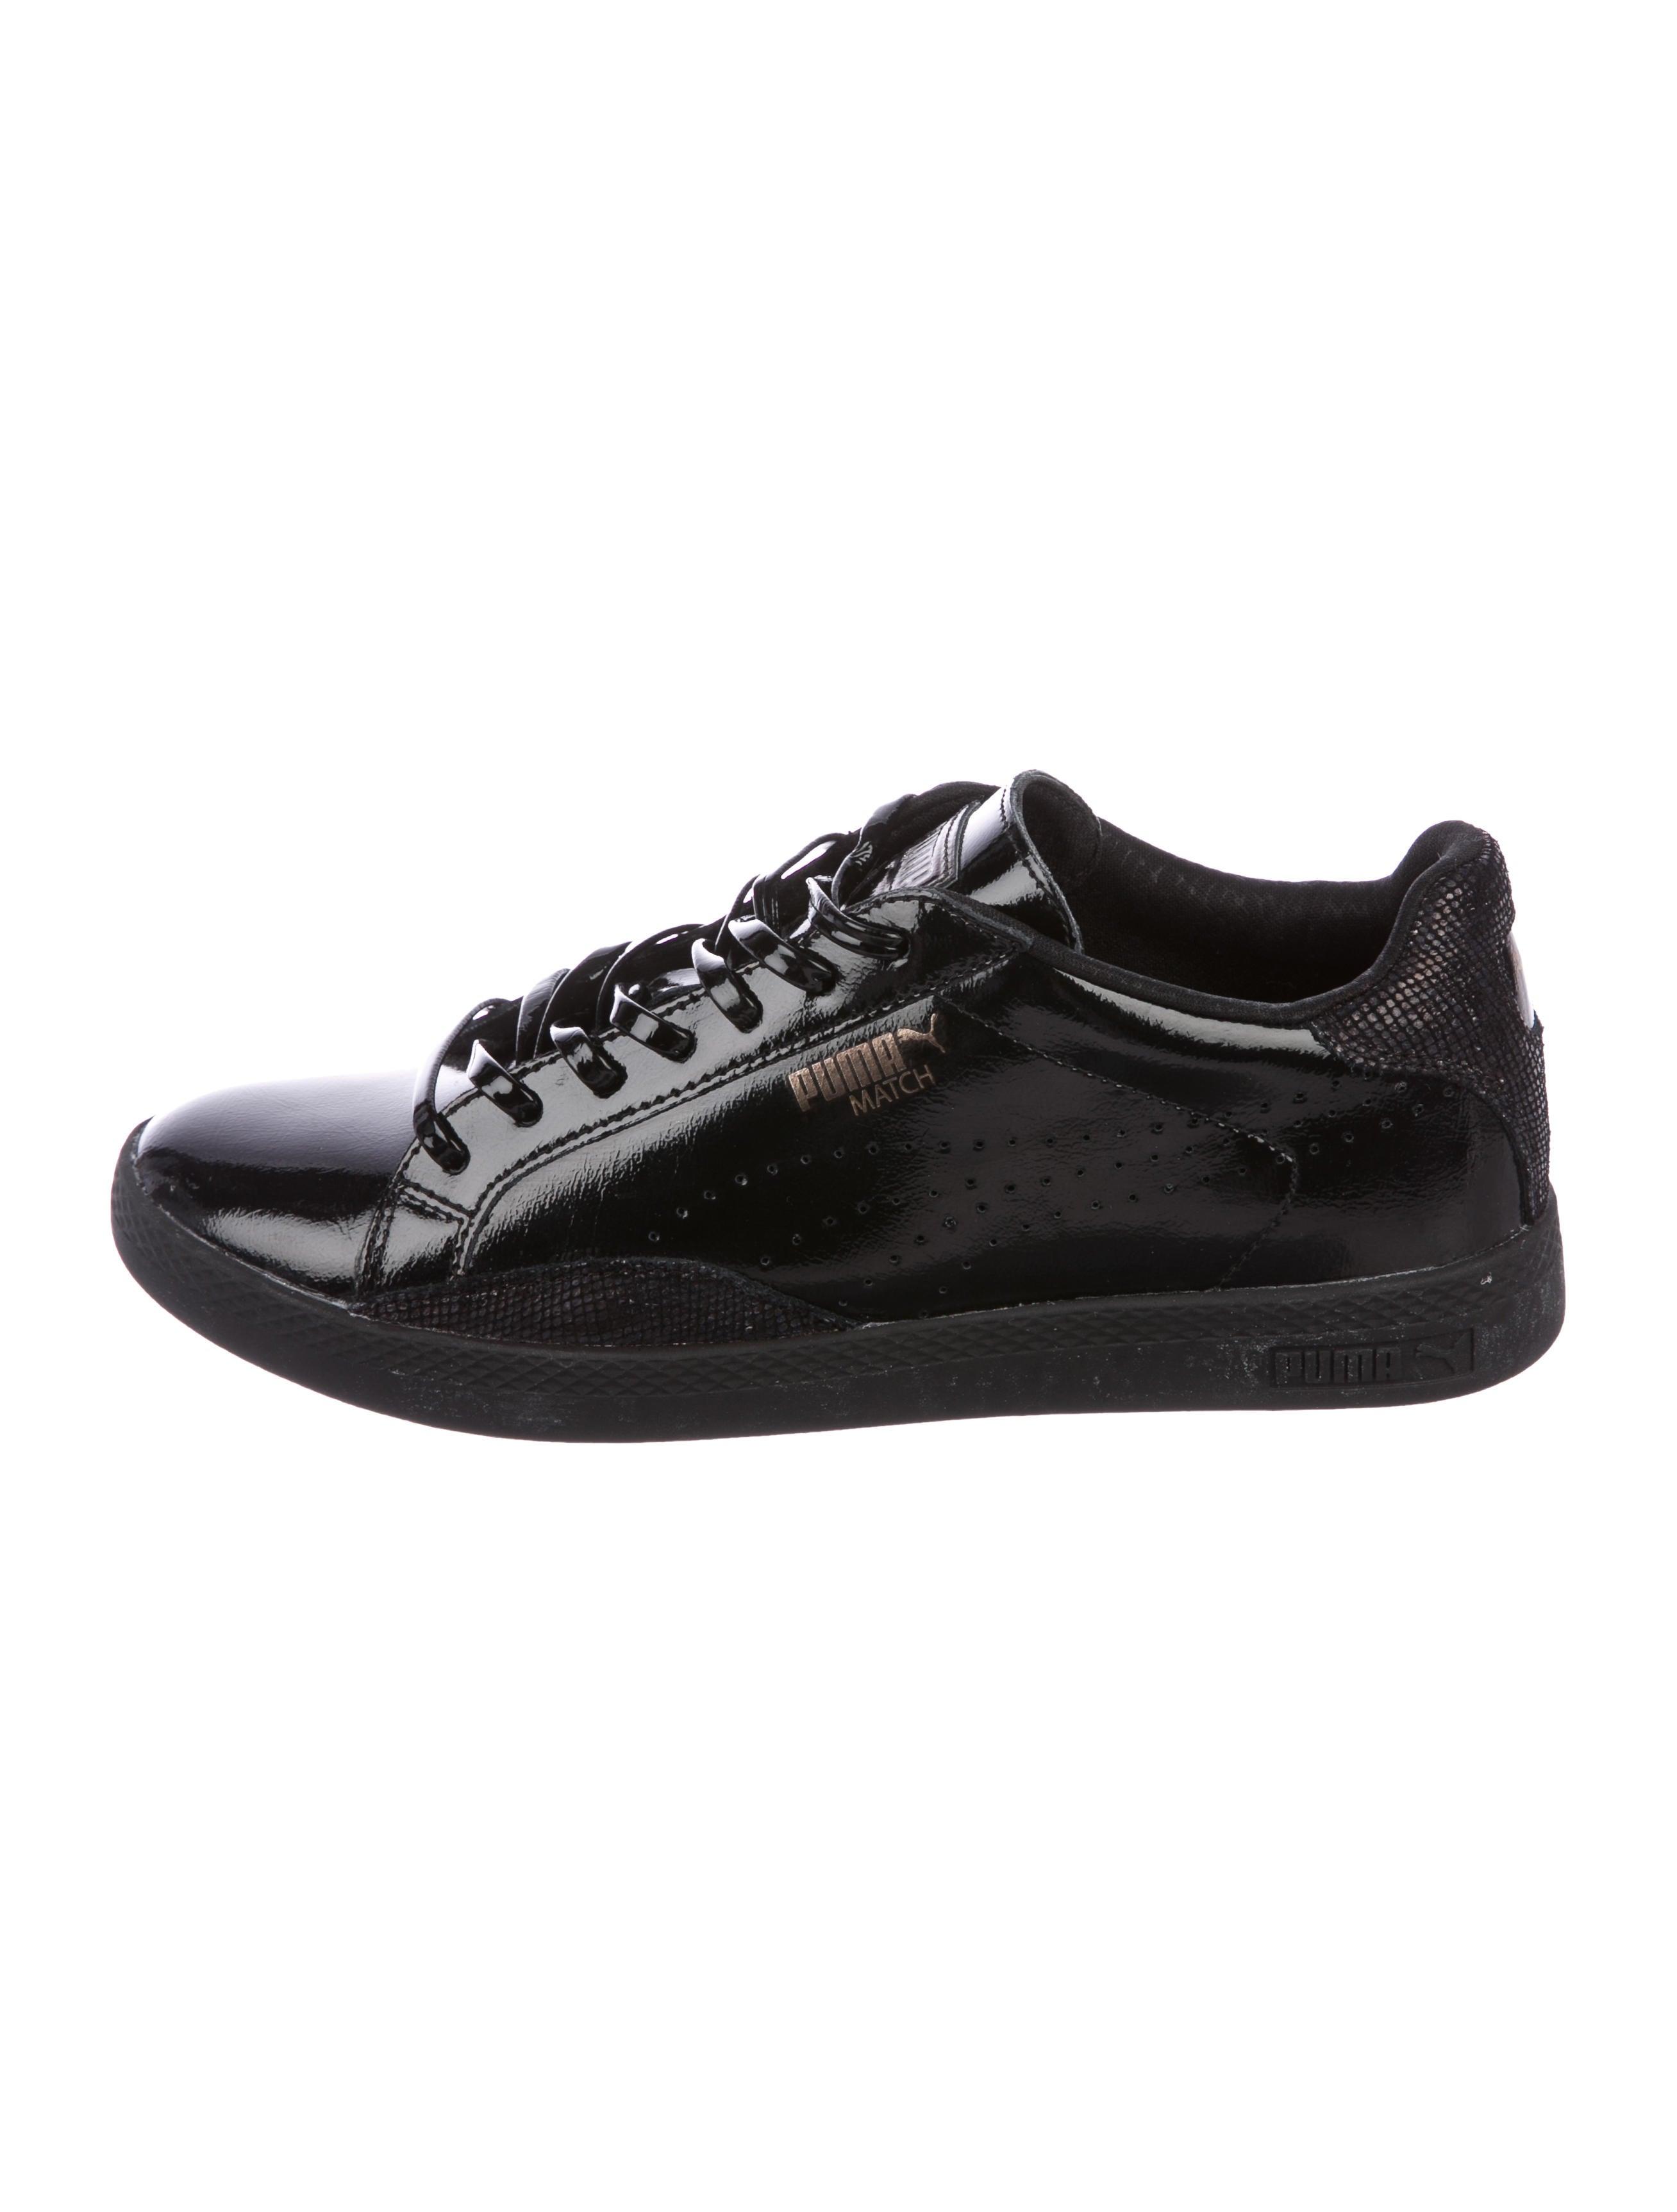 new product de560 dea81 Puma Match Patent Leather Sneakers - Shoes - WPUMA20196 ...